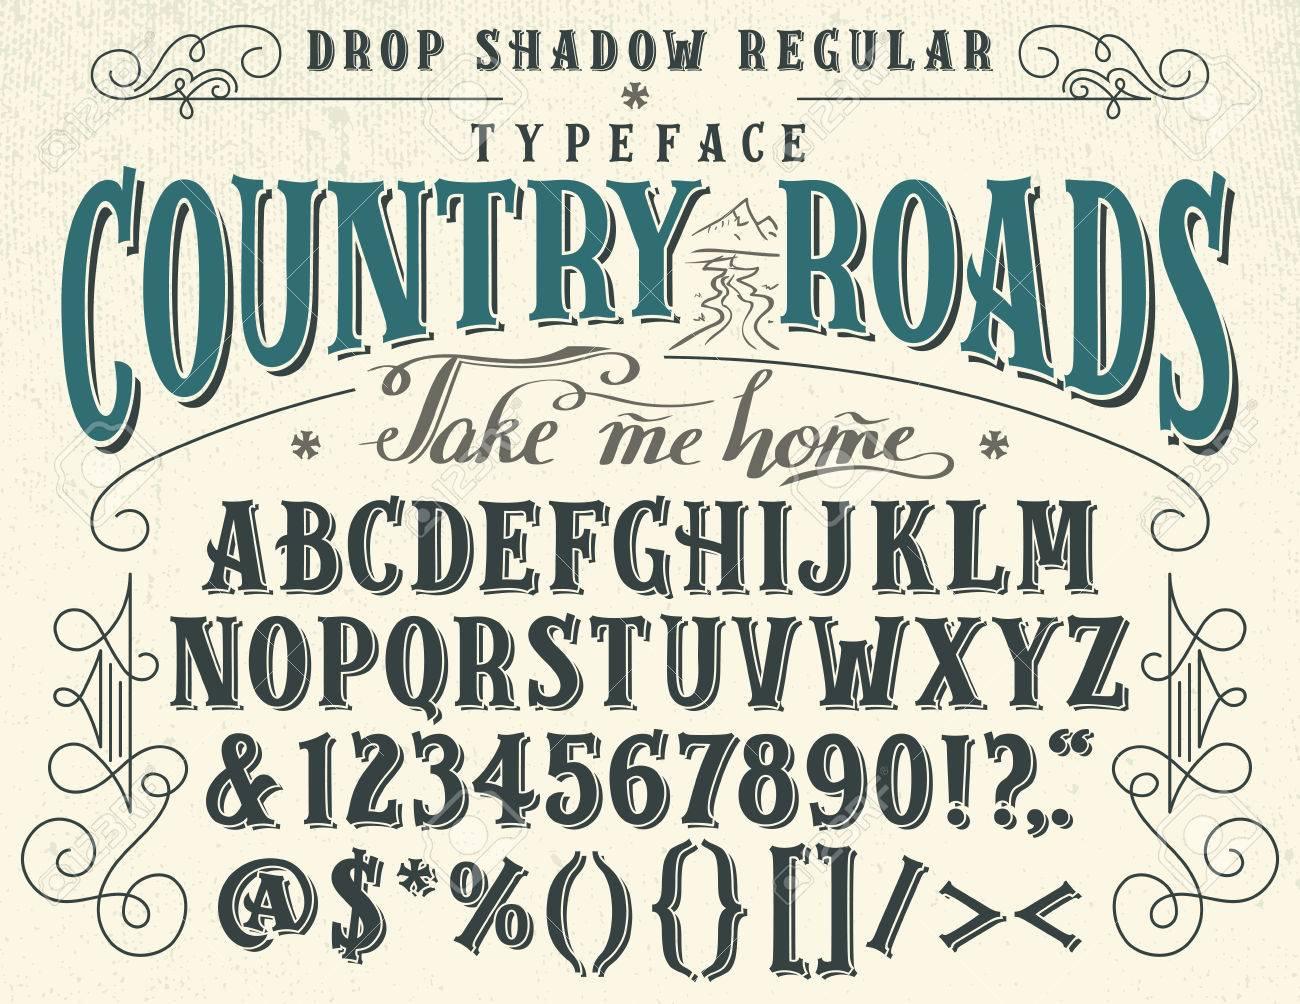 Handcrafted Retro Drop Shadow Regular Typeface Vintage Font